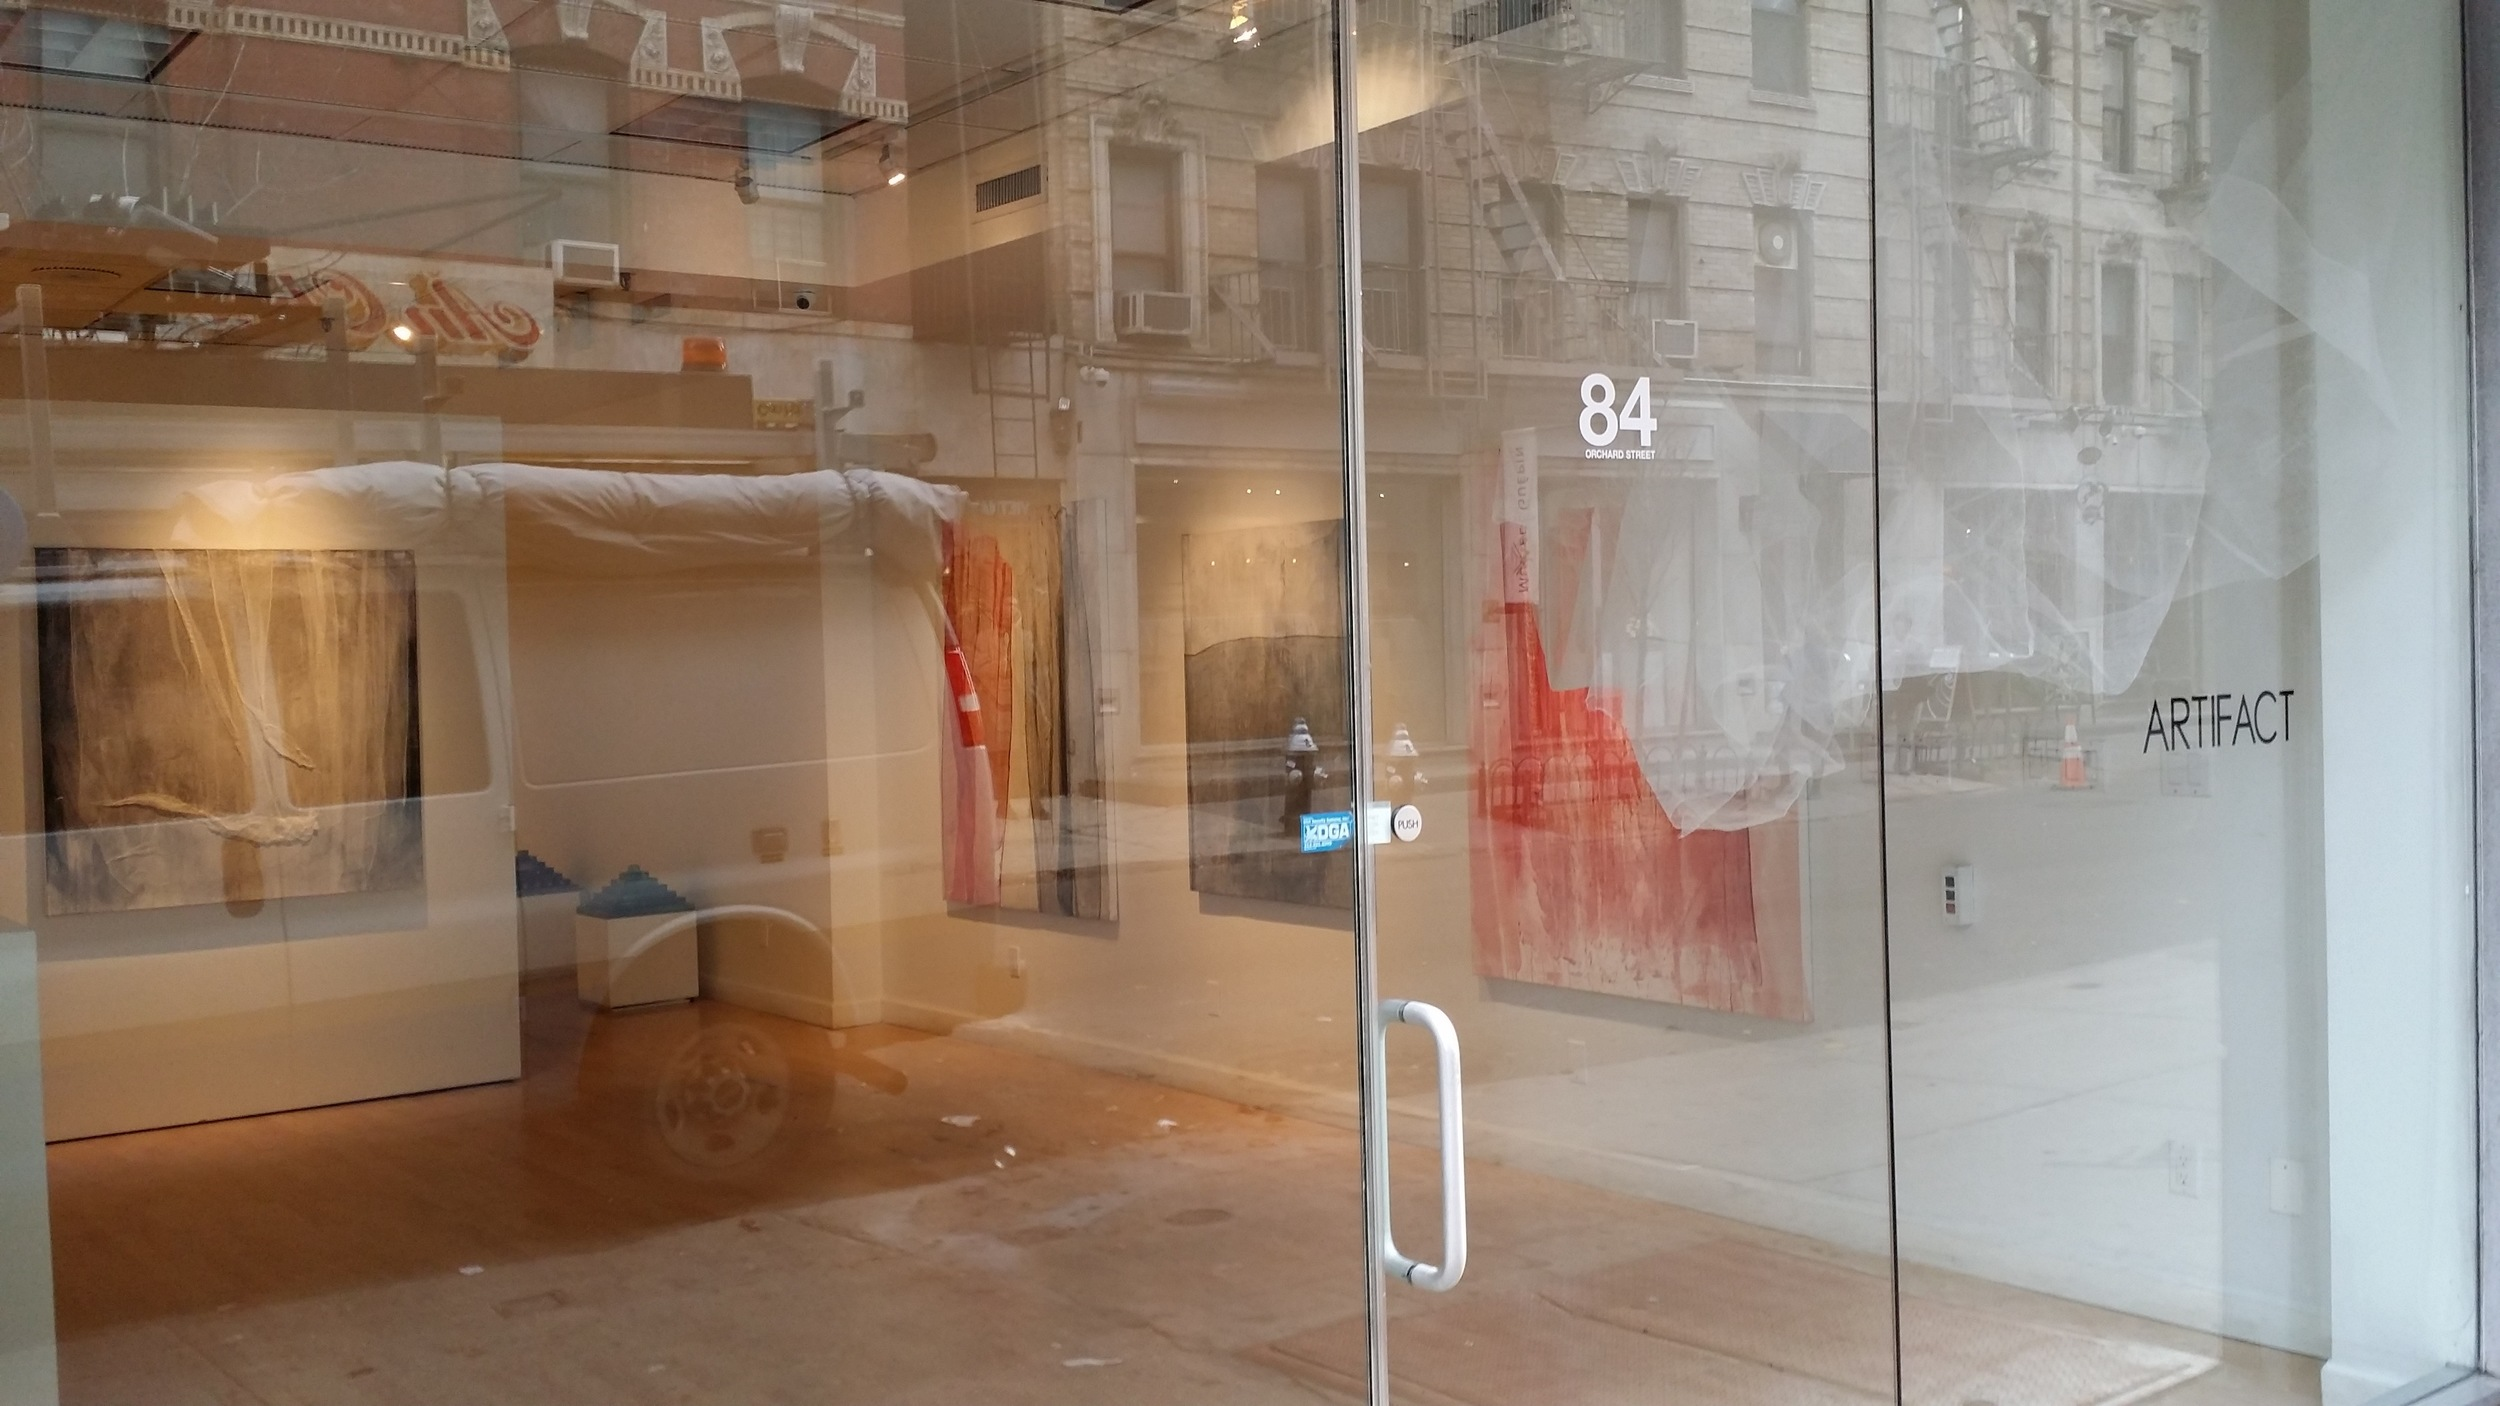 Artifact Gallery, 84 Orchard Street, New York, NY 10002 Tel. (212) 475-0448